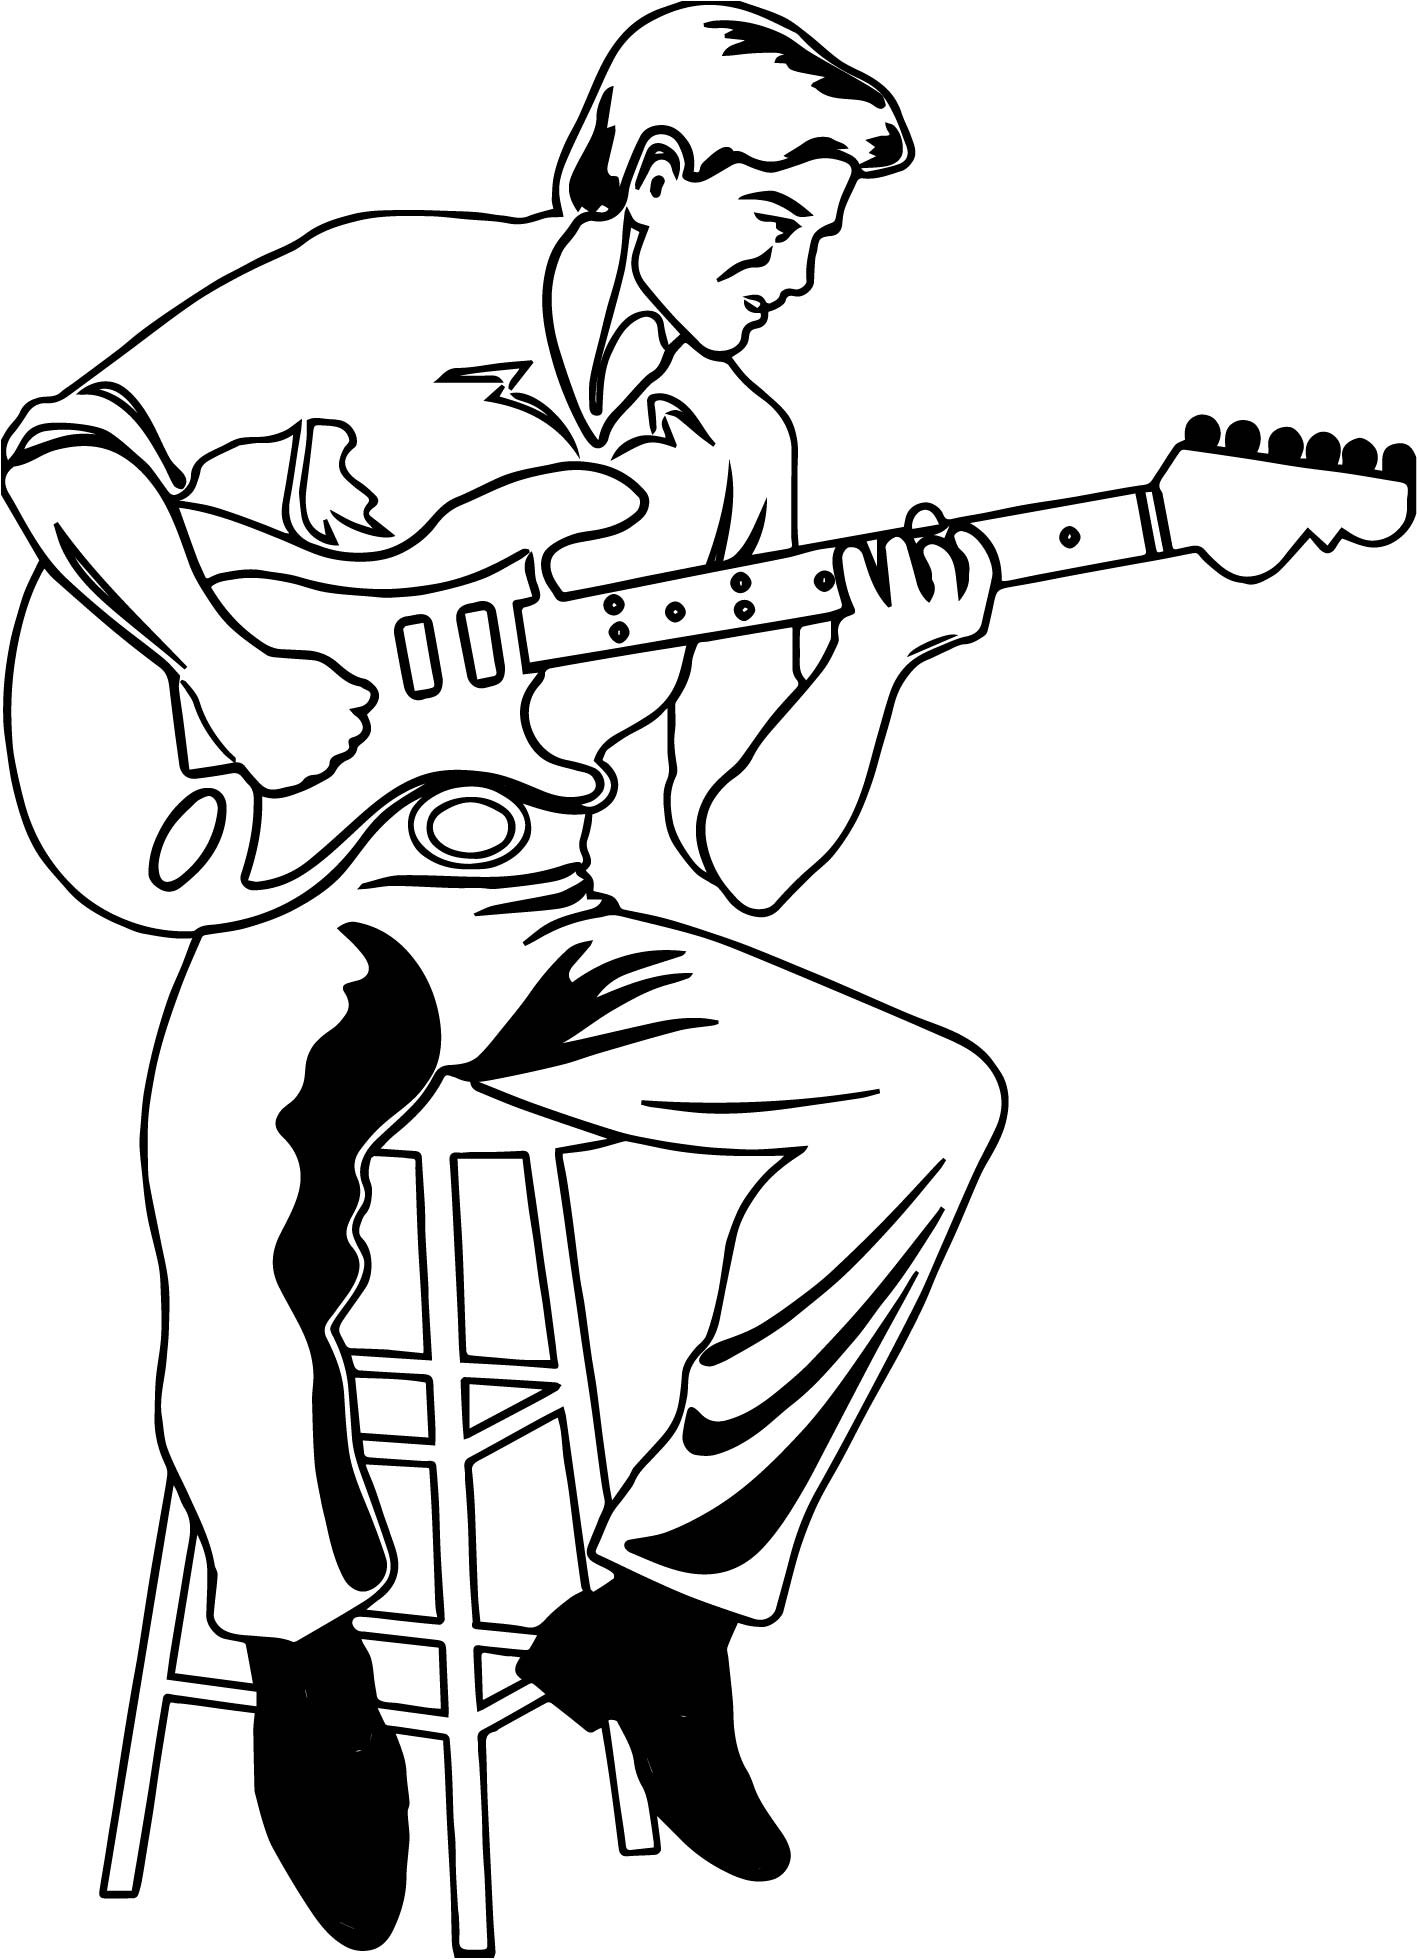 1417x1959 Profitable Guitar Player Coloring Page Color